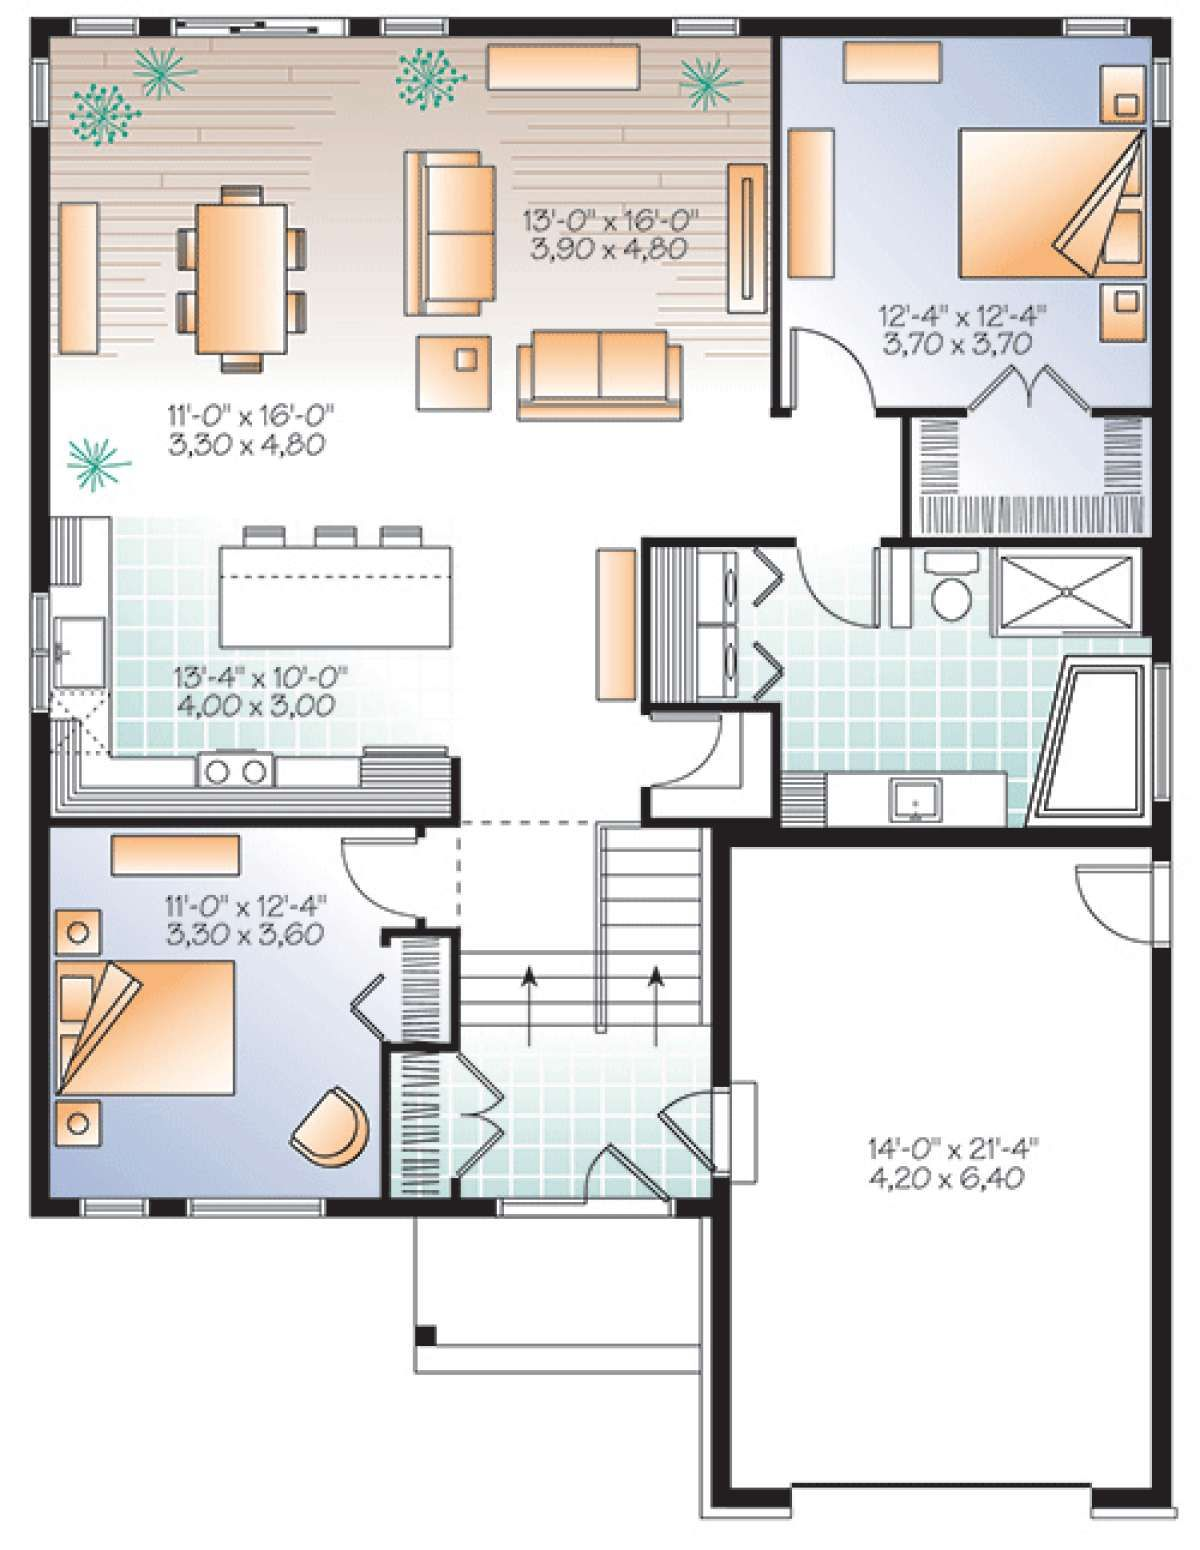 House Plan 03401129 Modern Plan 1,339 Square Feet, 2